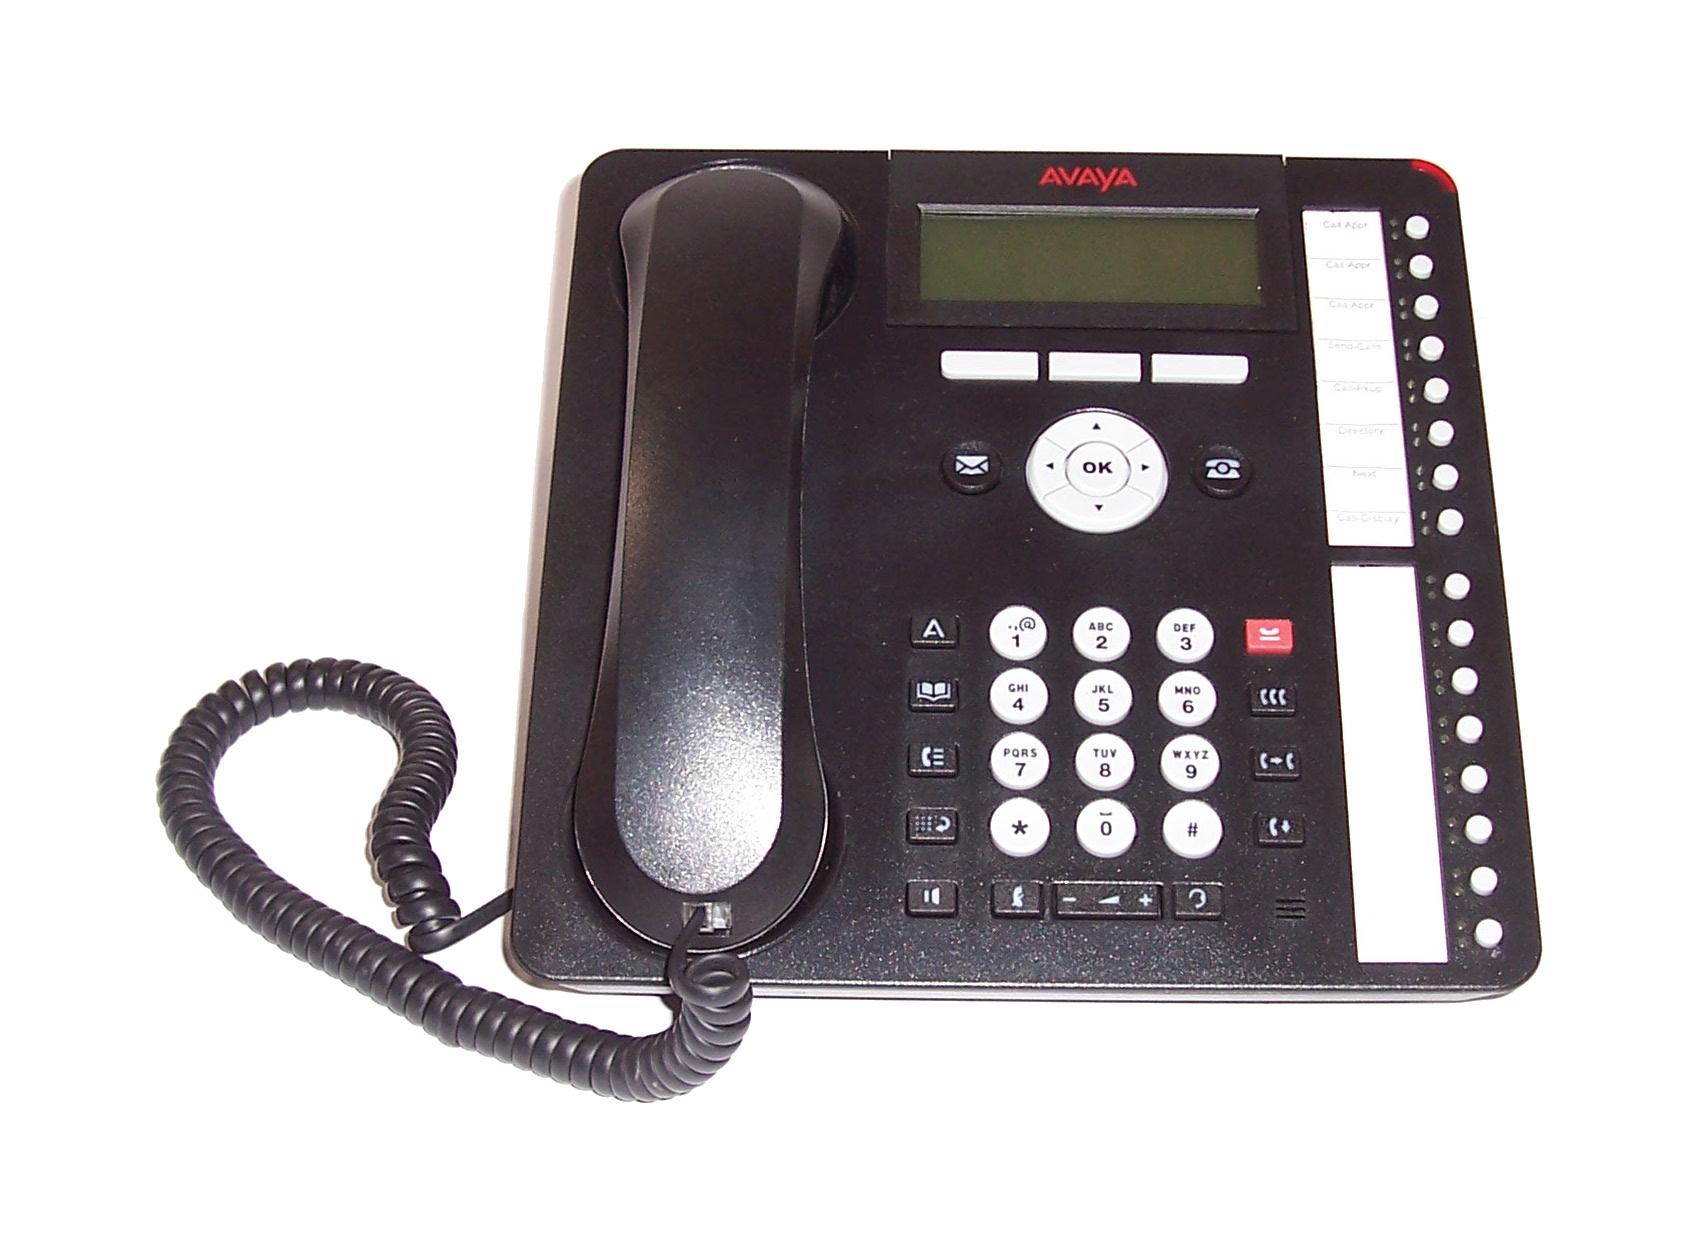 Avaya 700504843 Model: 1616-I 1600 series IP Deskphone- PoE- Black